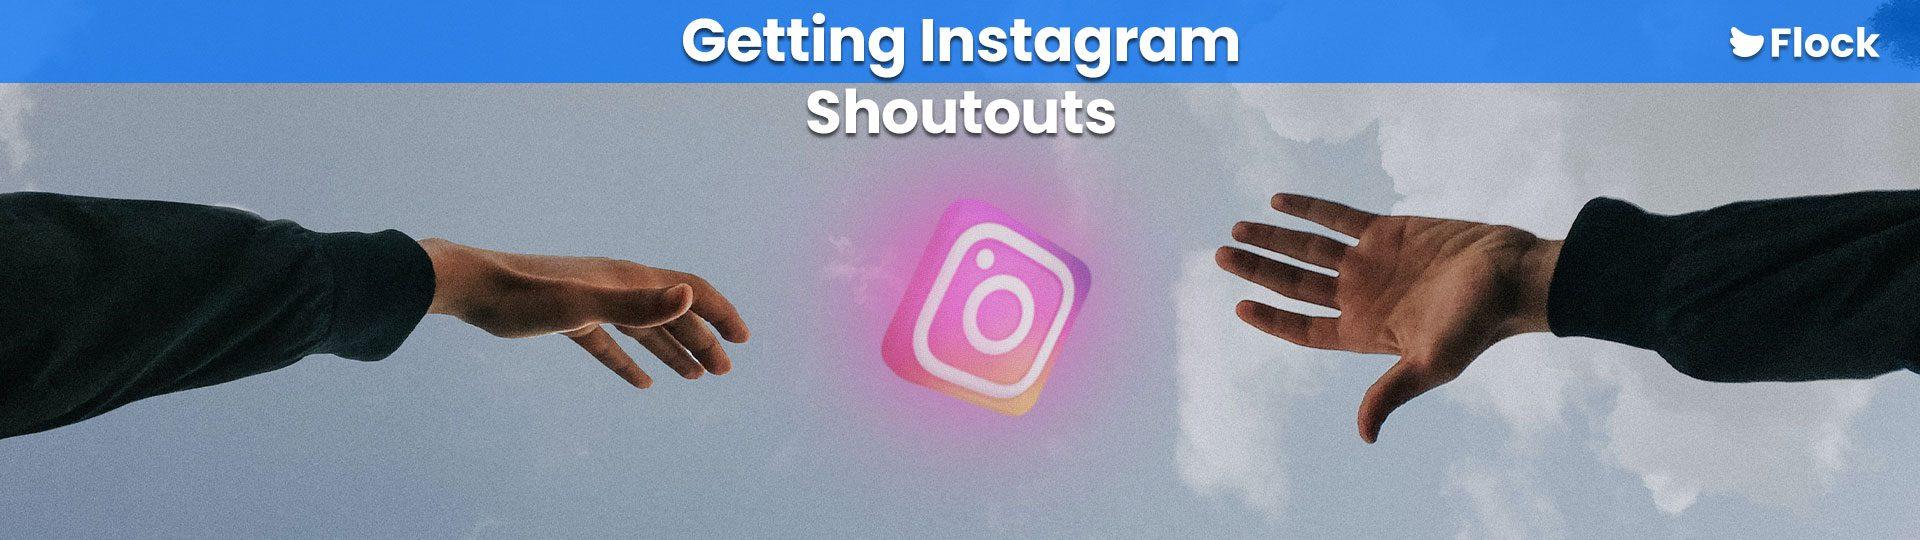 Getting instagram shoutouts